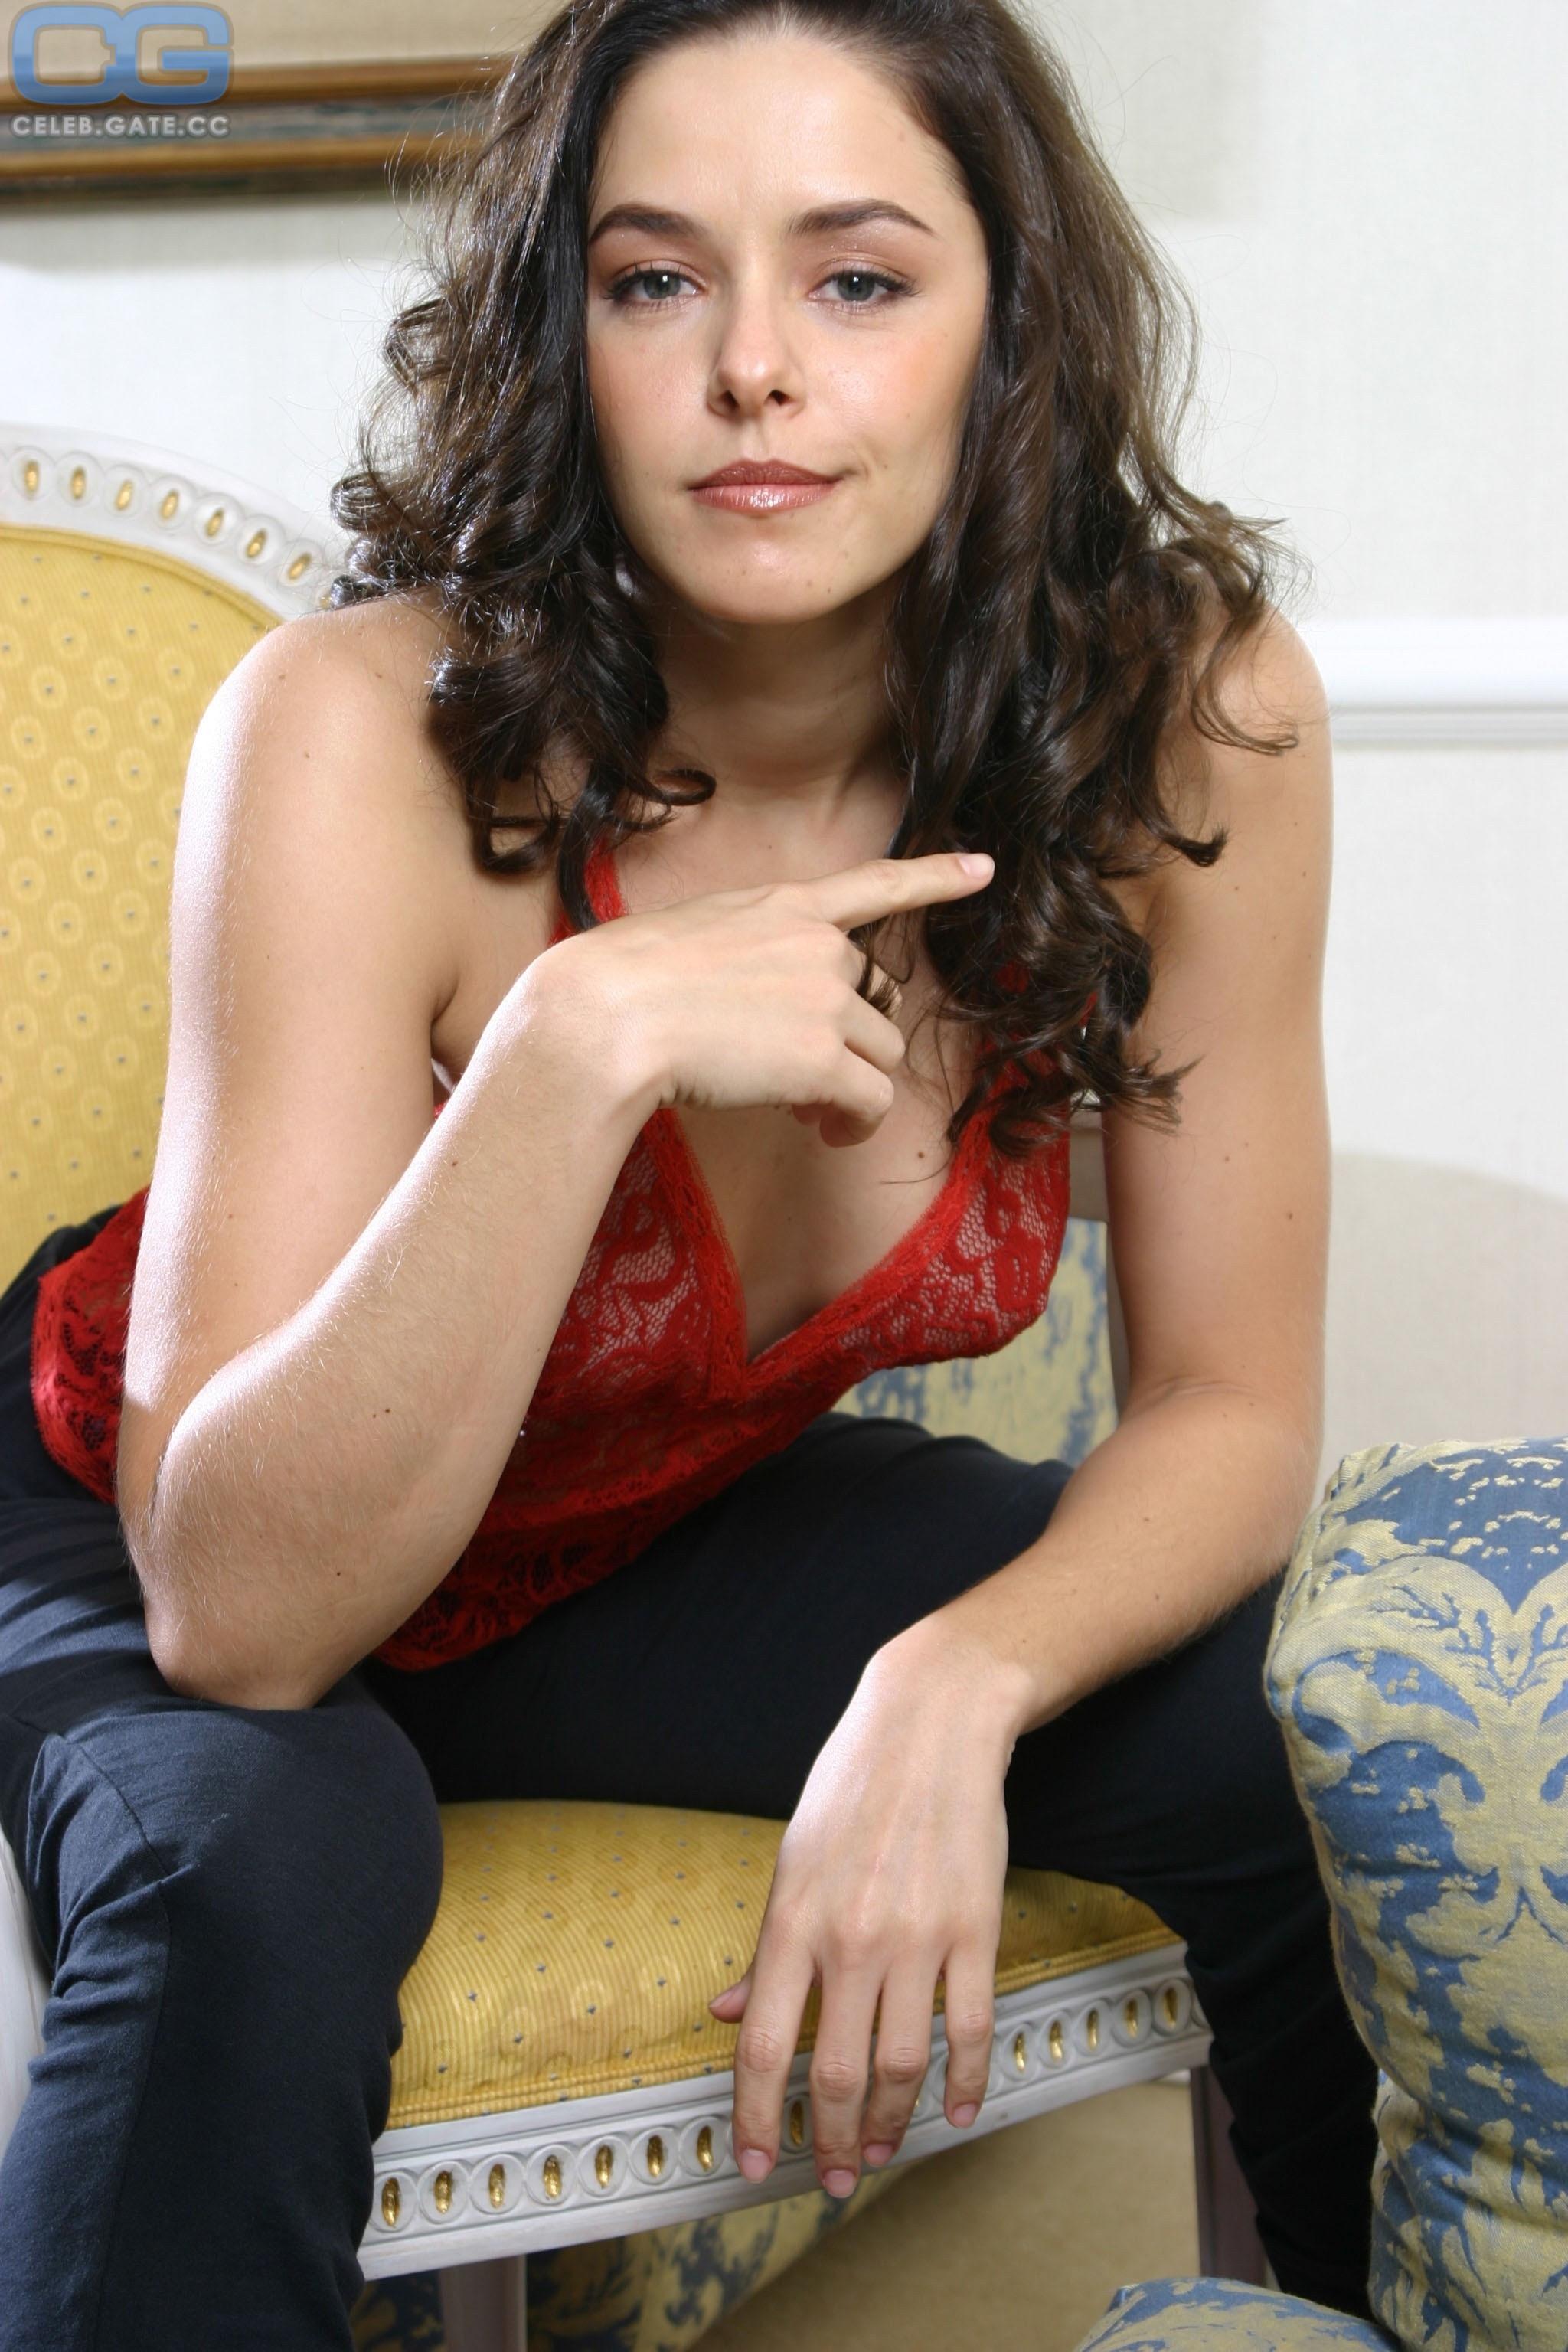 nackt Kamrau Britta GALLERY: A